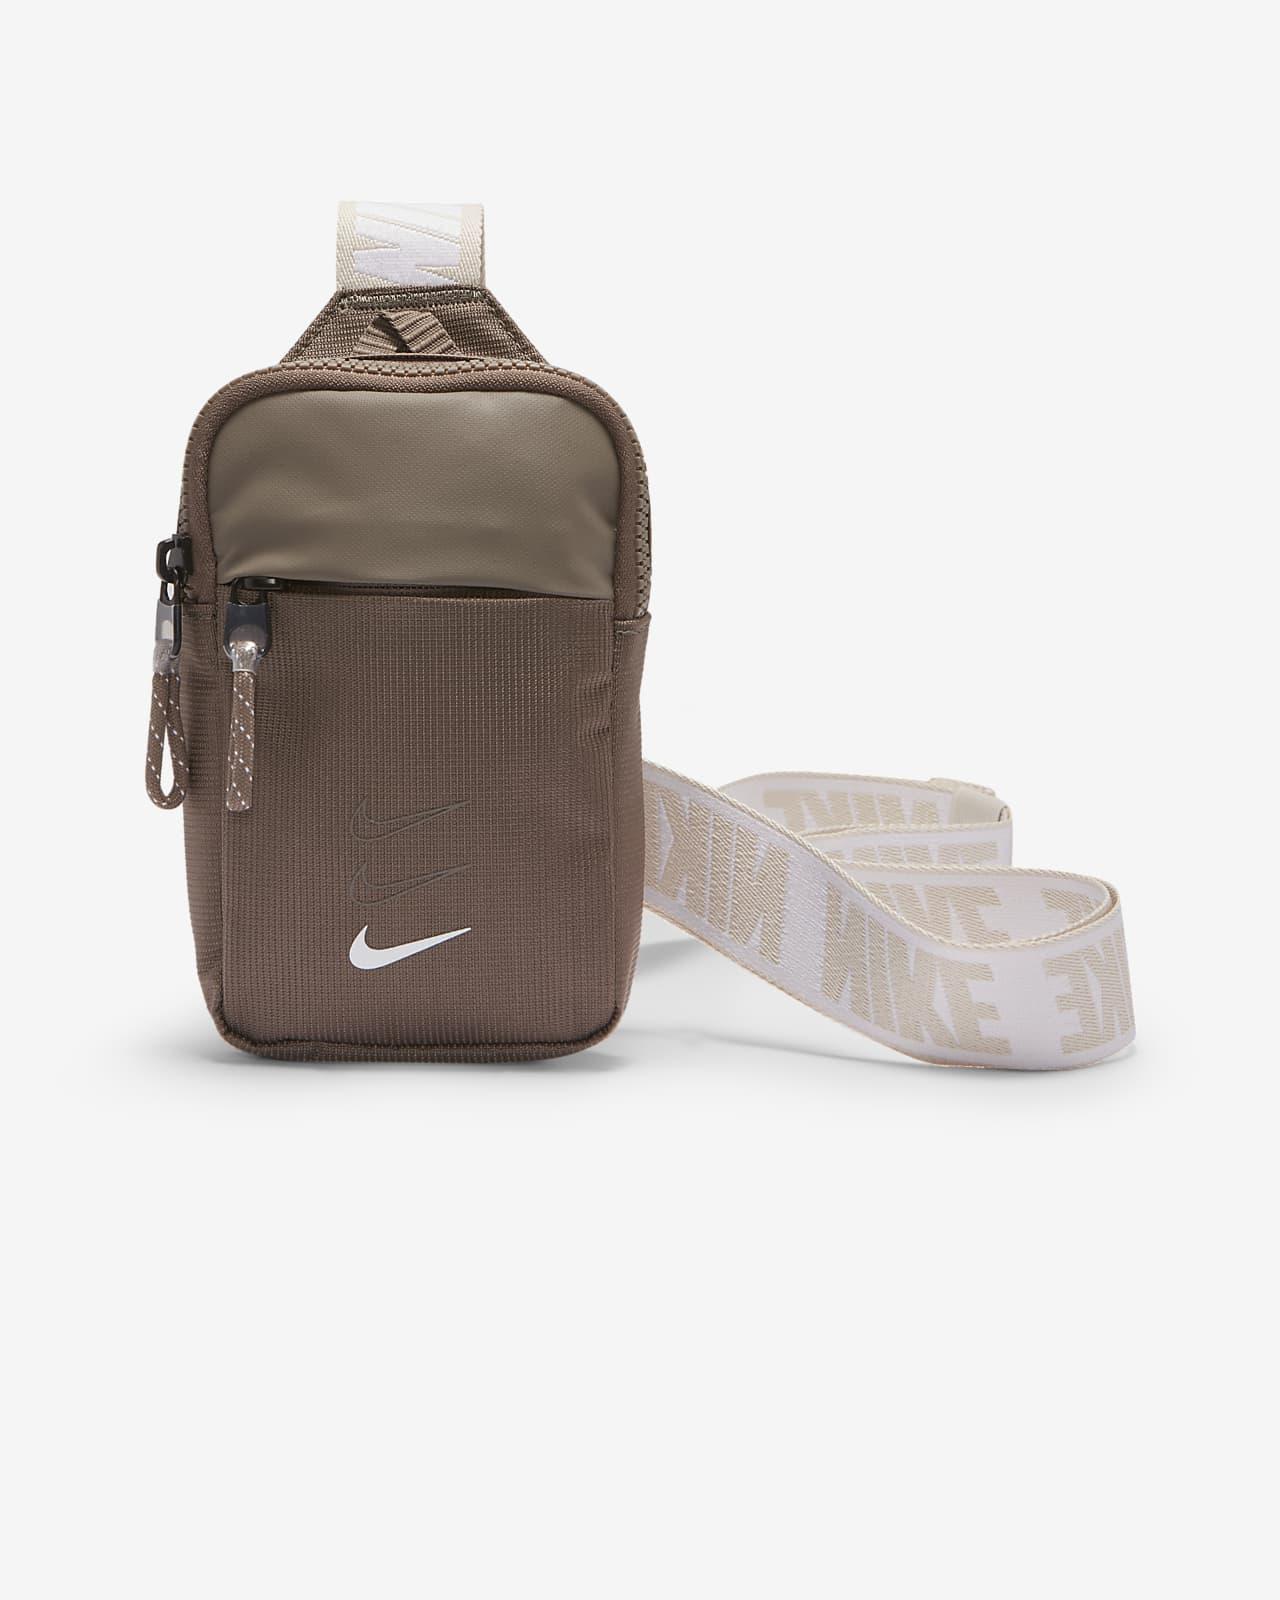 Sac banane Nike Sportswear Essentials (petite taille)